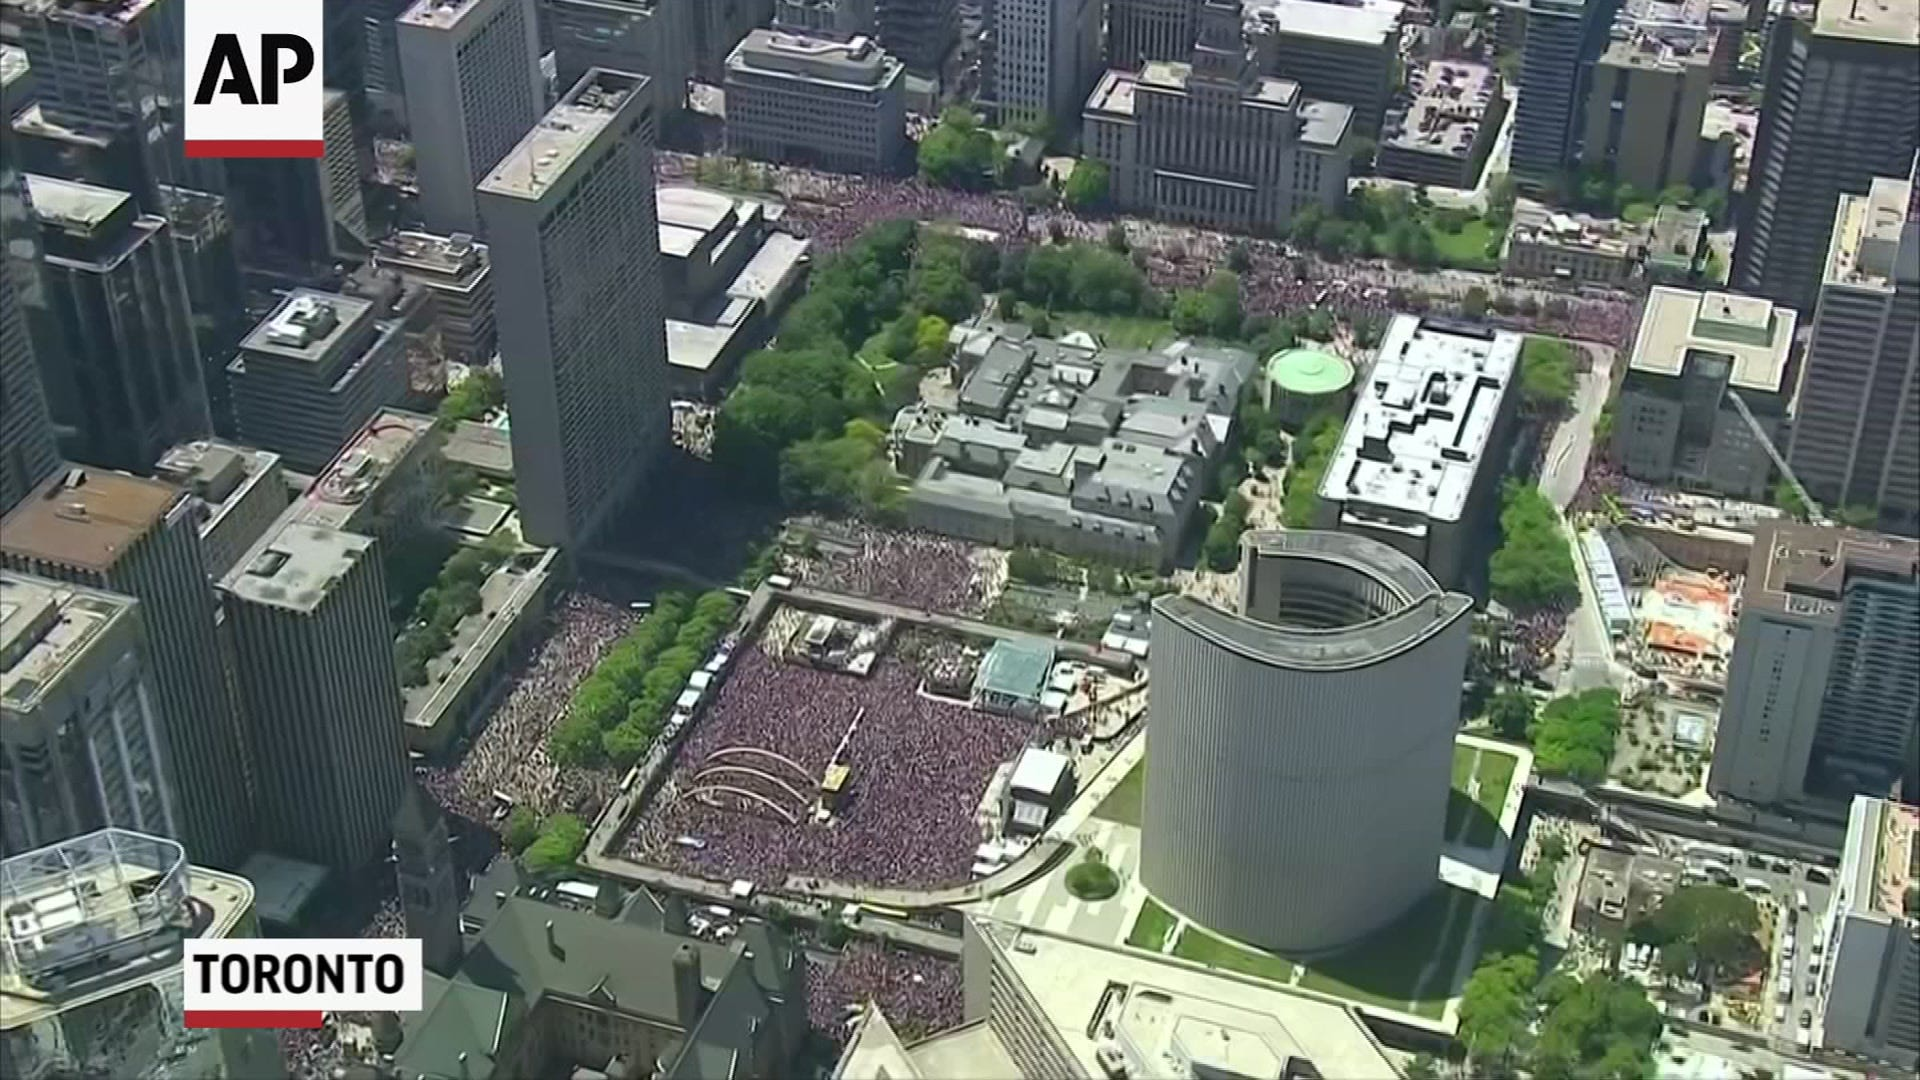 Toronto celebrates Raptors' NBA championship